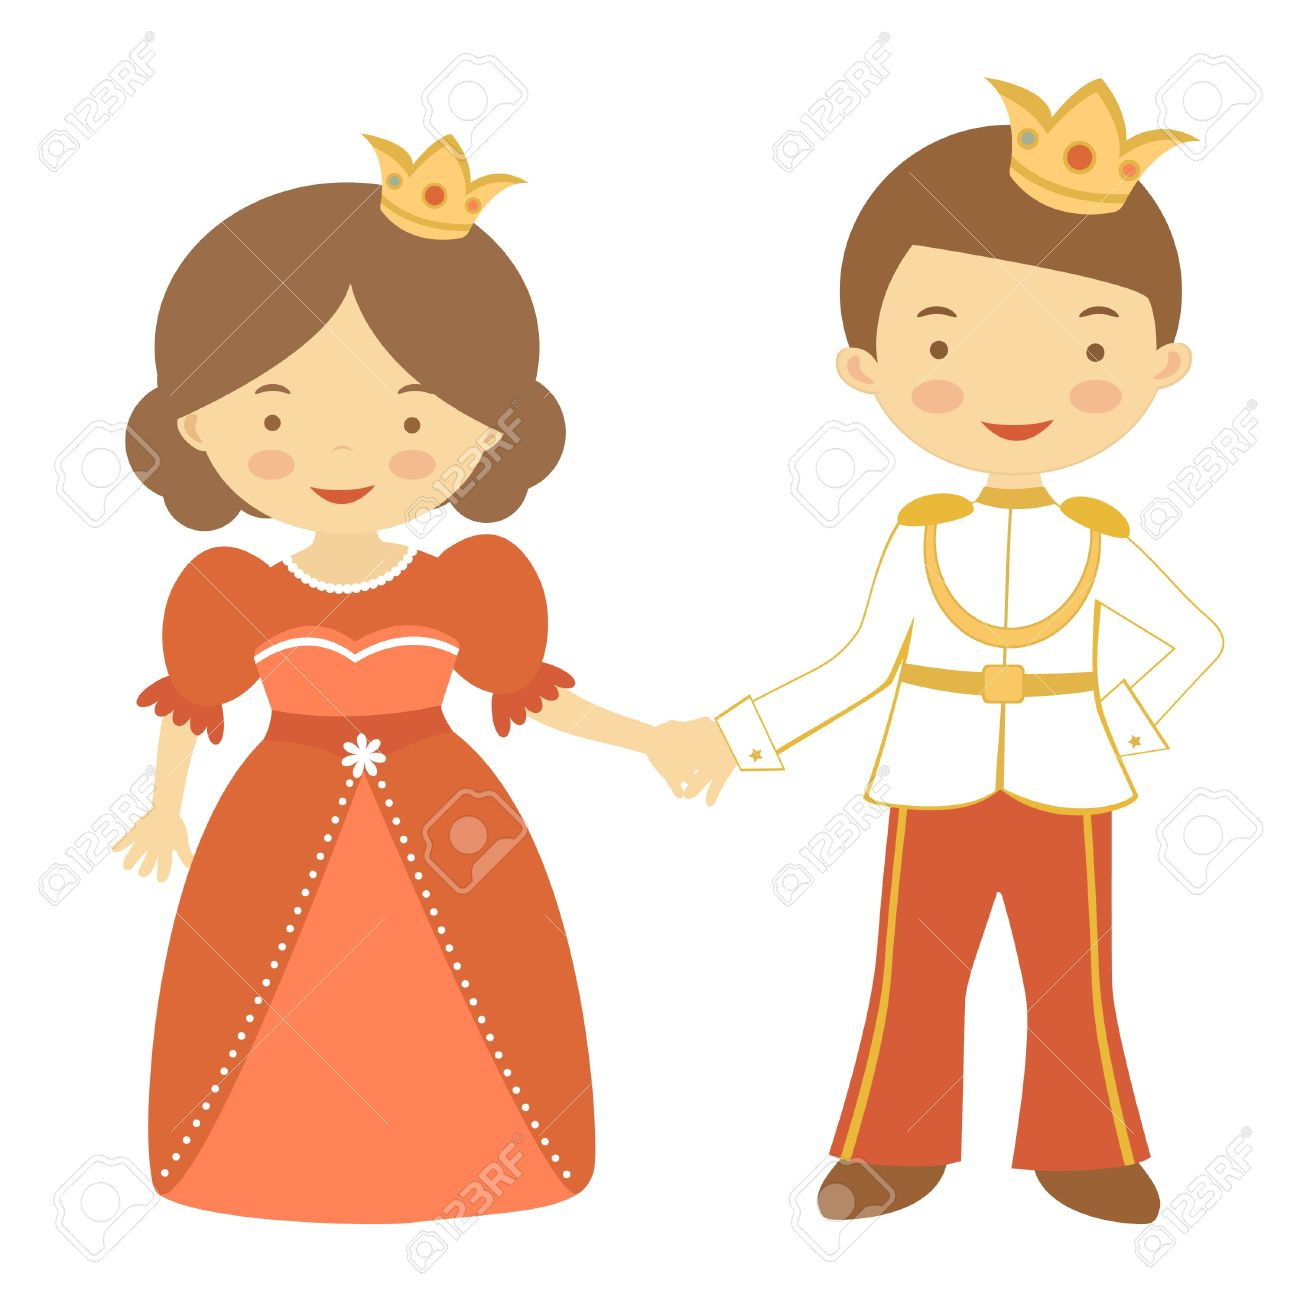 1300x1300 Princess And Prince Clipart 101 Clip Art